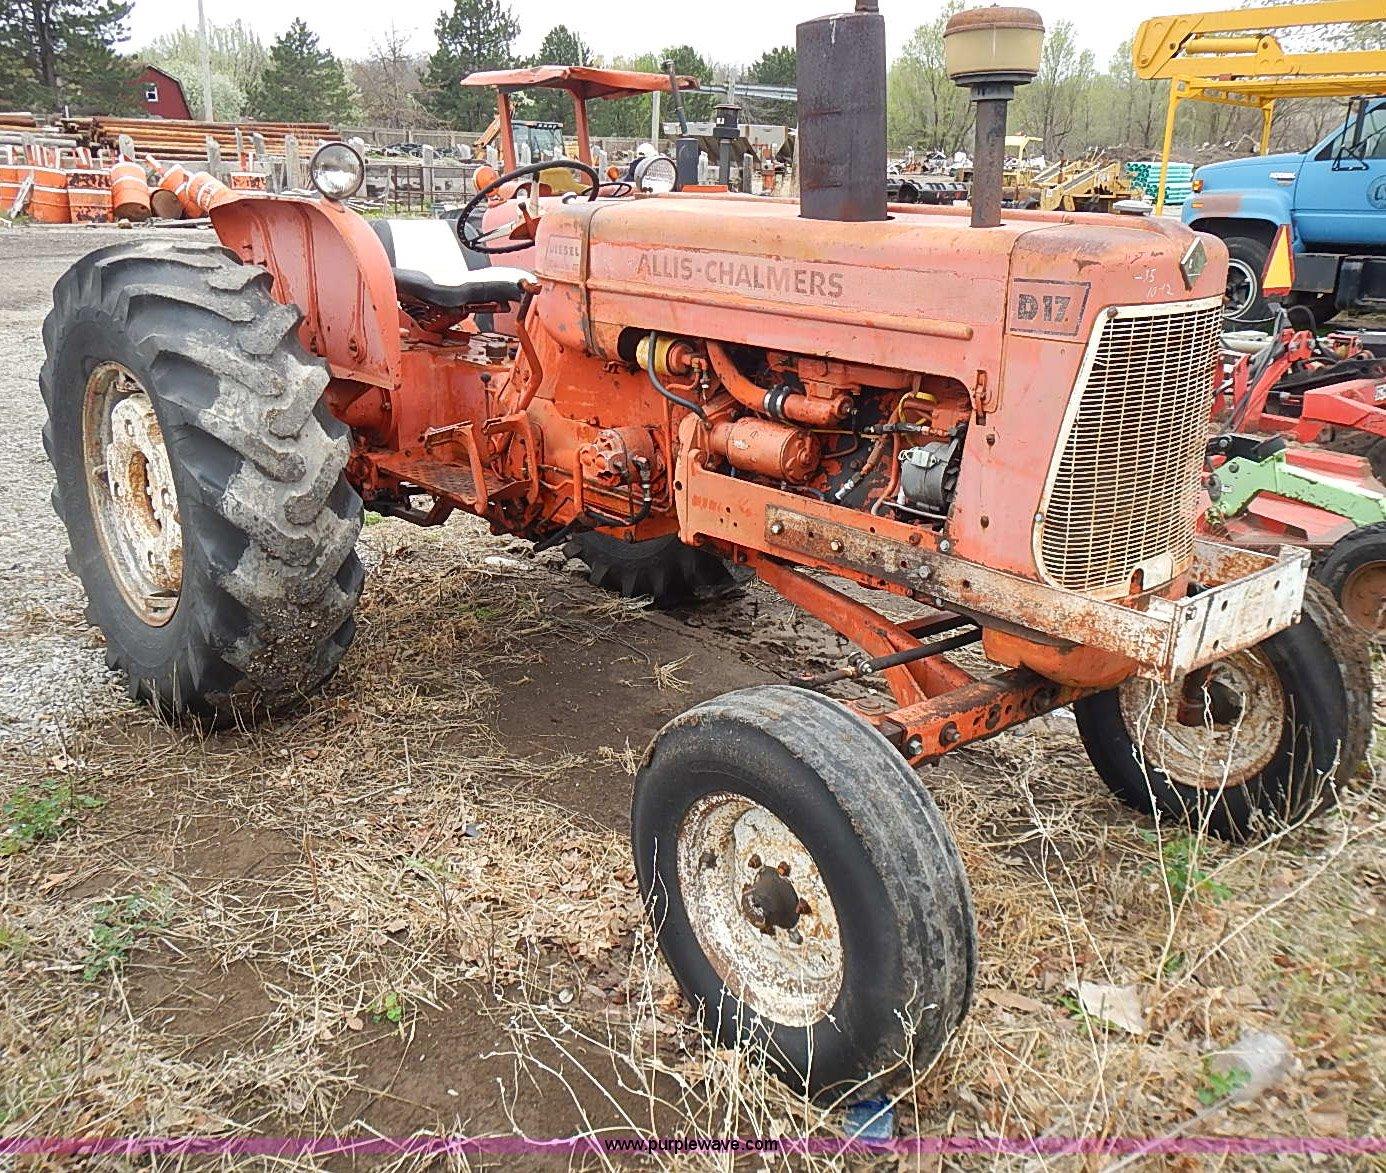 1967 Allis Chalmers D17 Series IV tractor   Item I3653   SOL